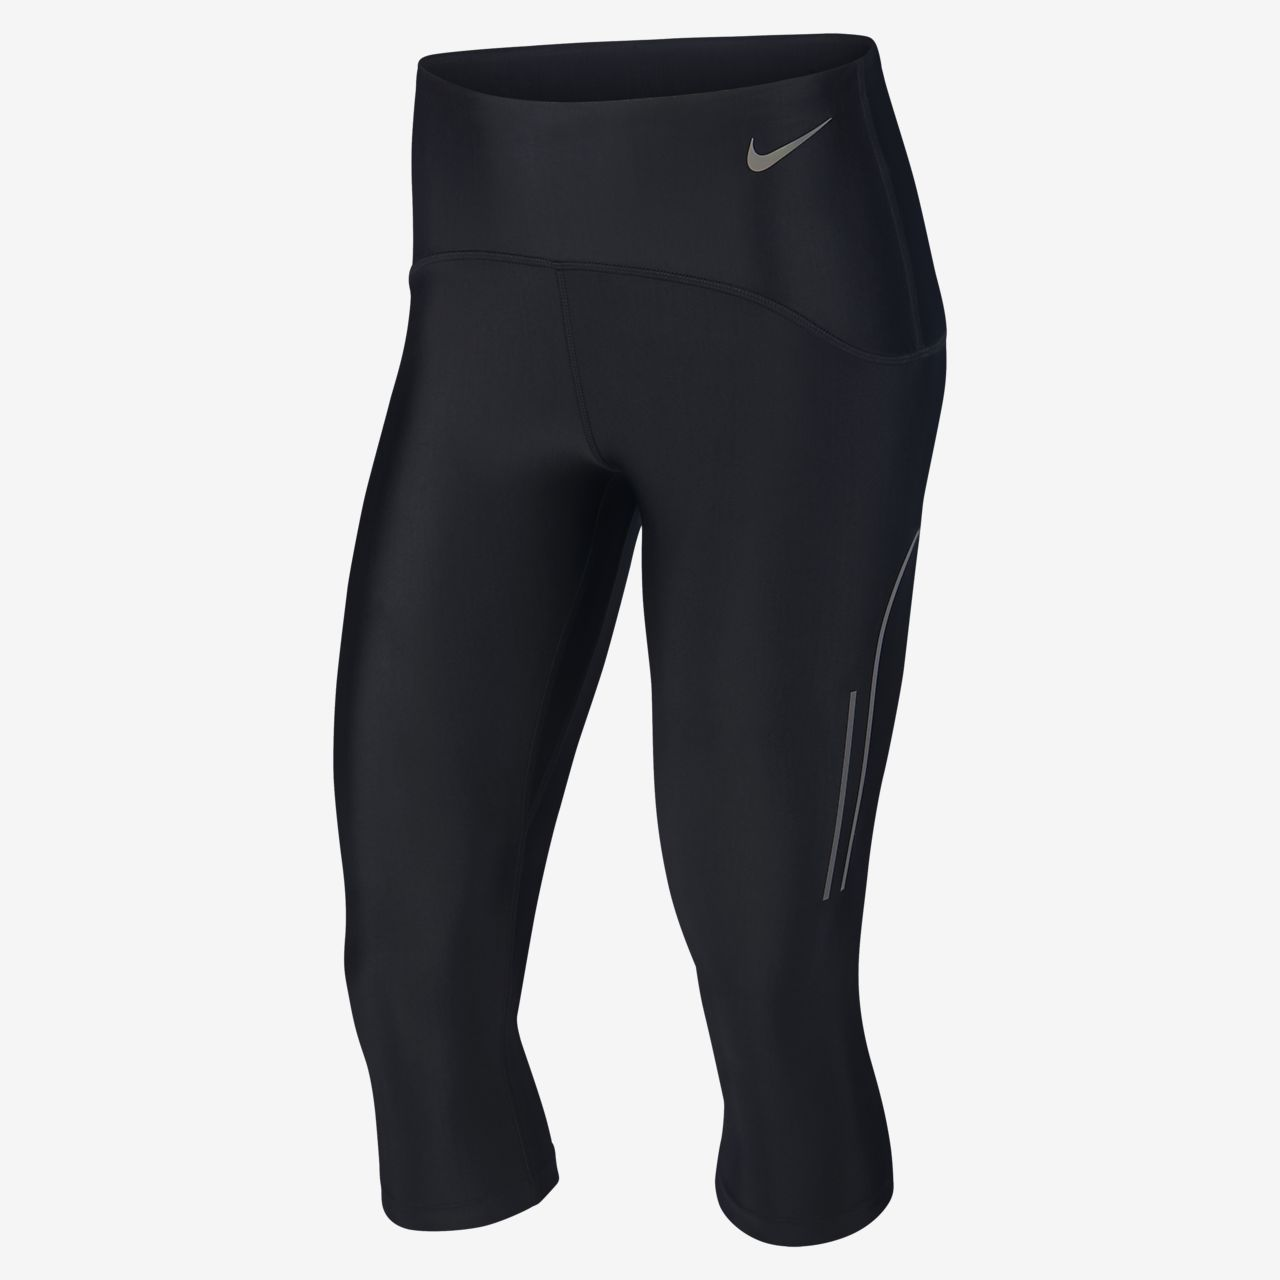 Corsaire de running Nike Speed pour Femme